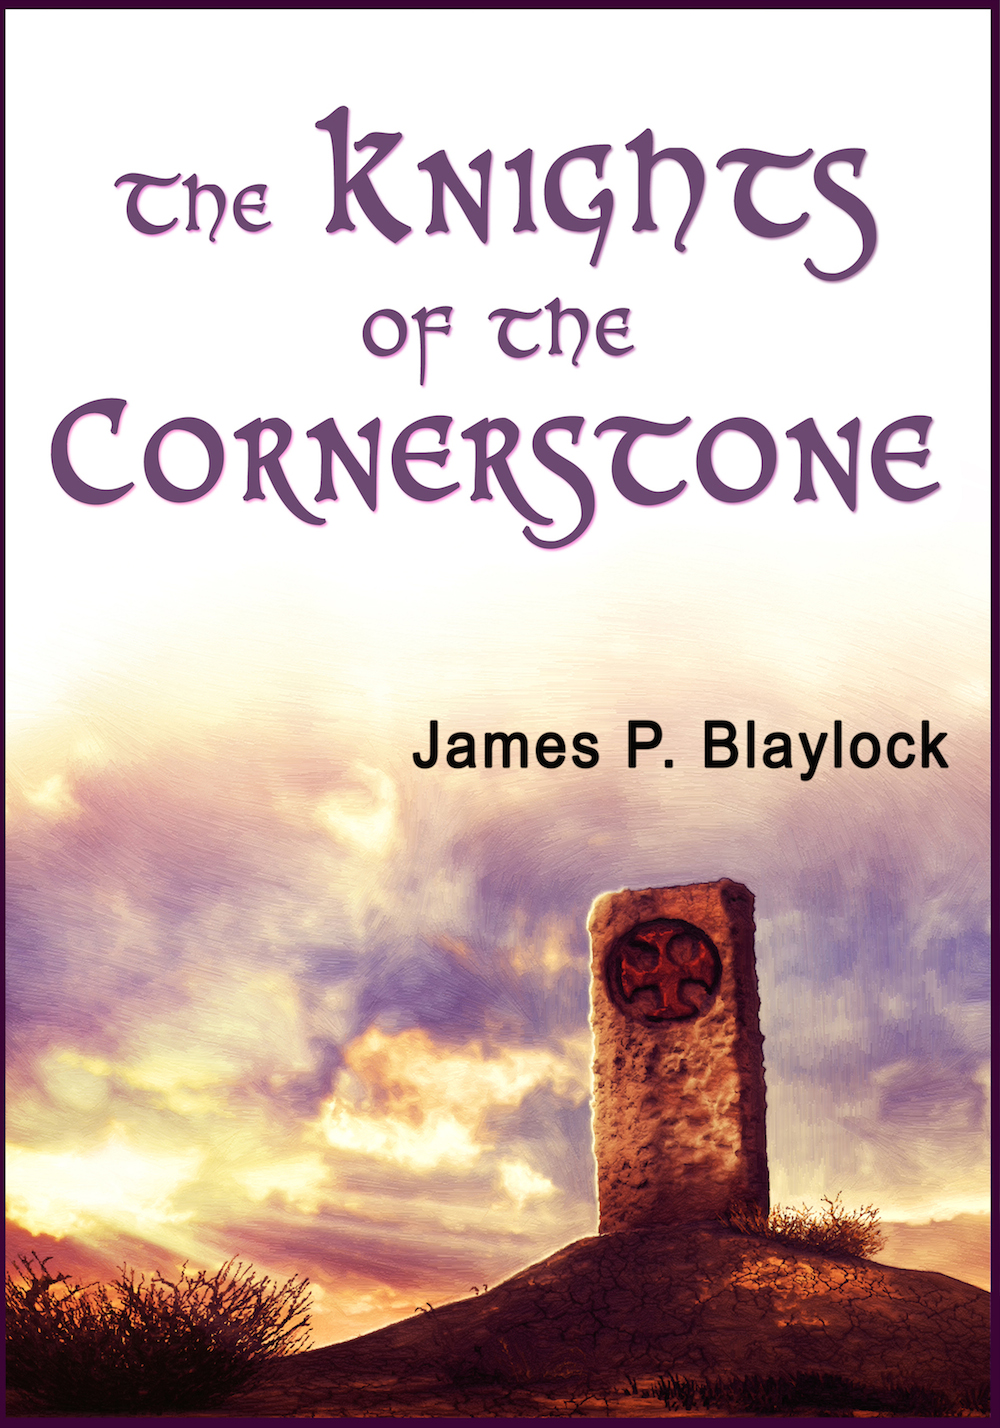 Blaylock_KnightsoftheCornerstone